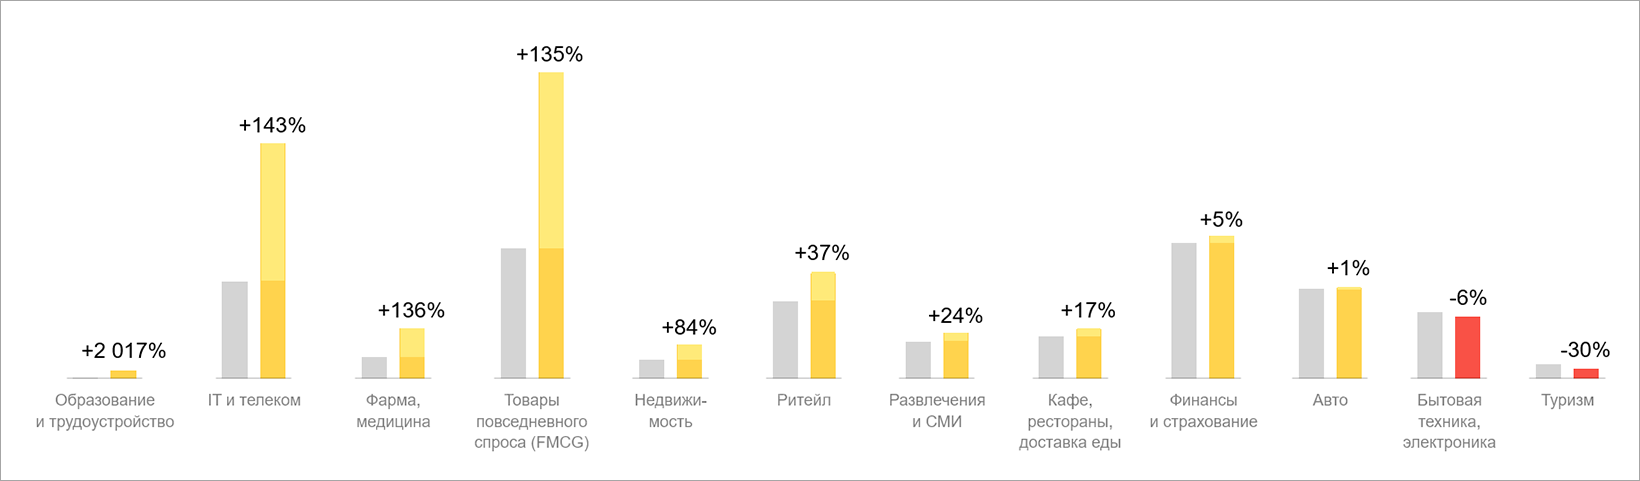 Сравнение вложений по отраслям в видеосети Яндекса